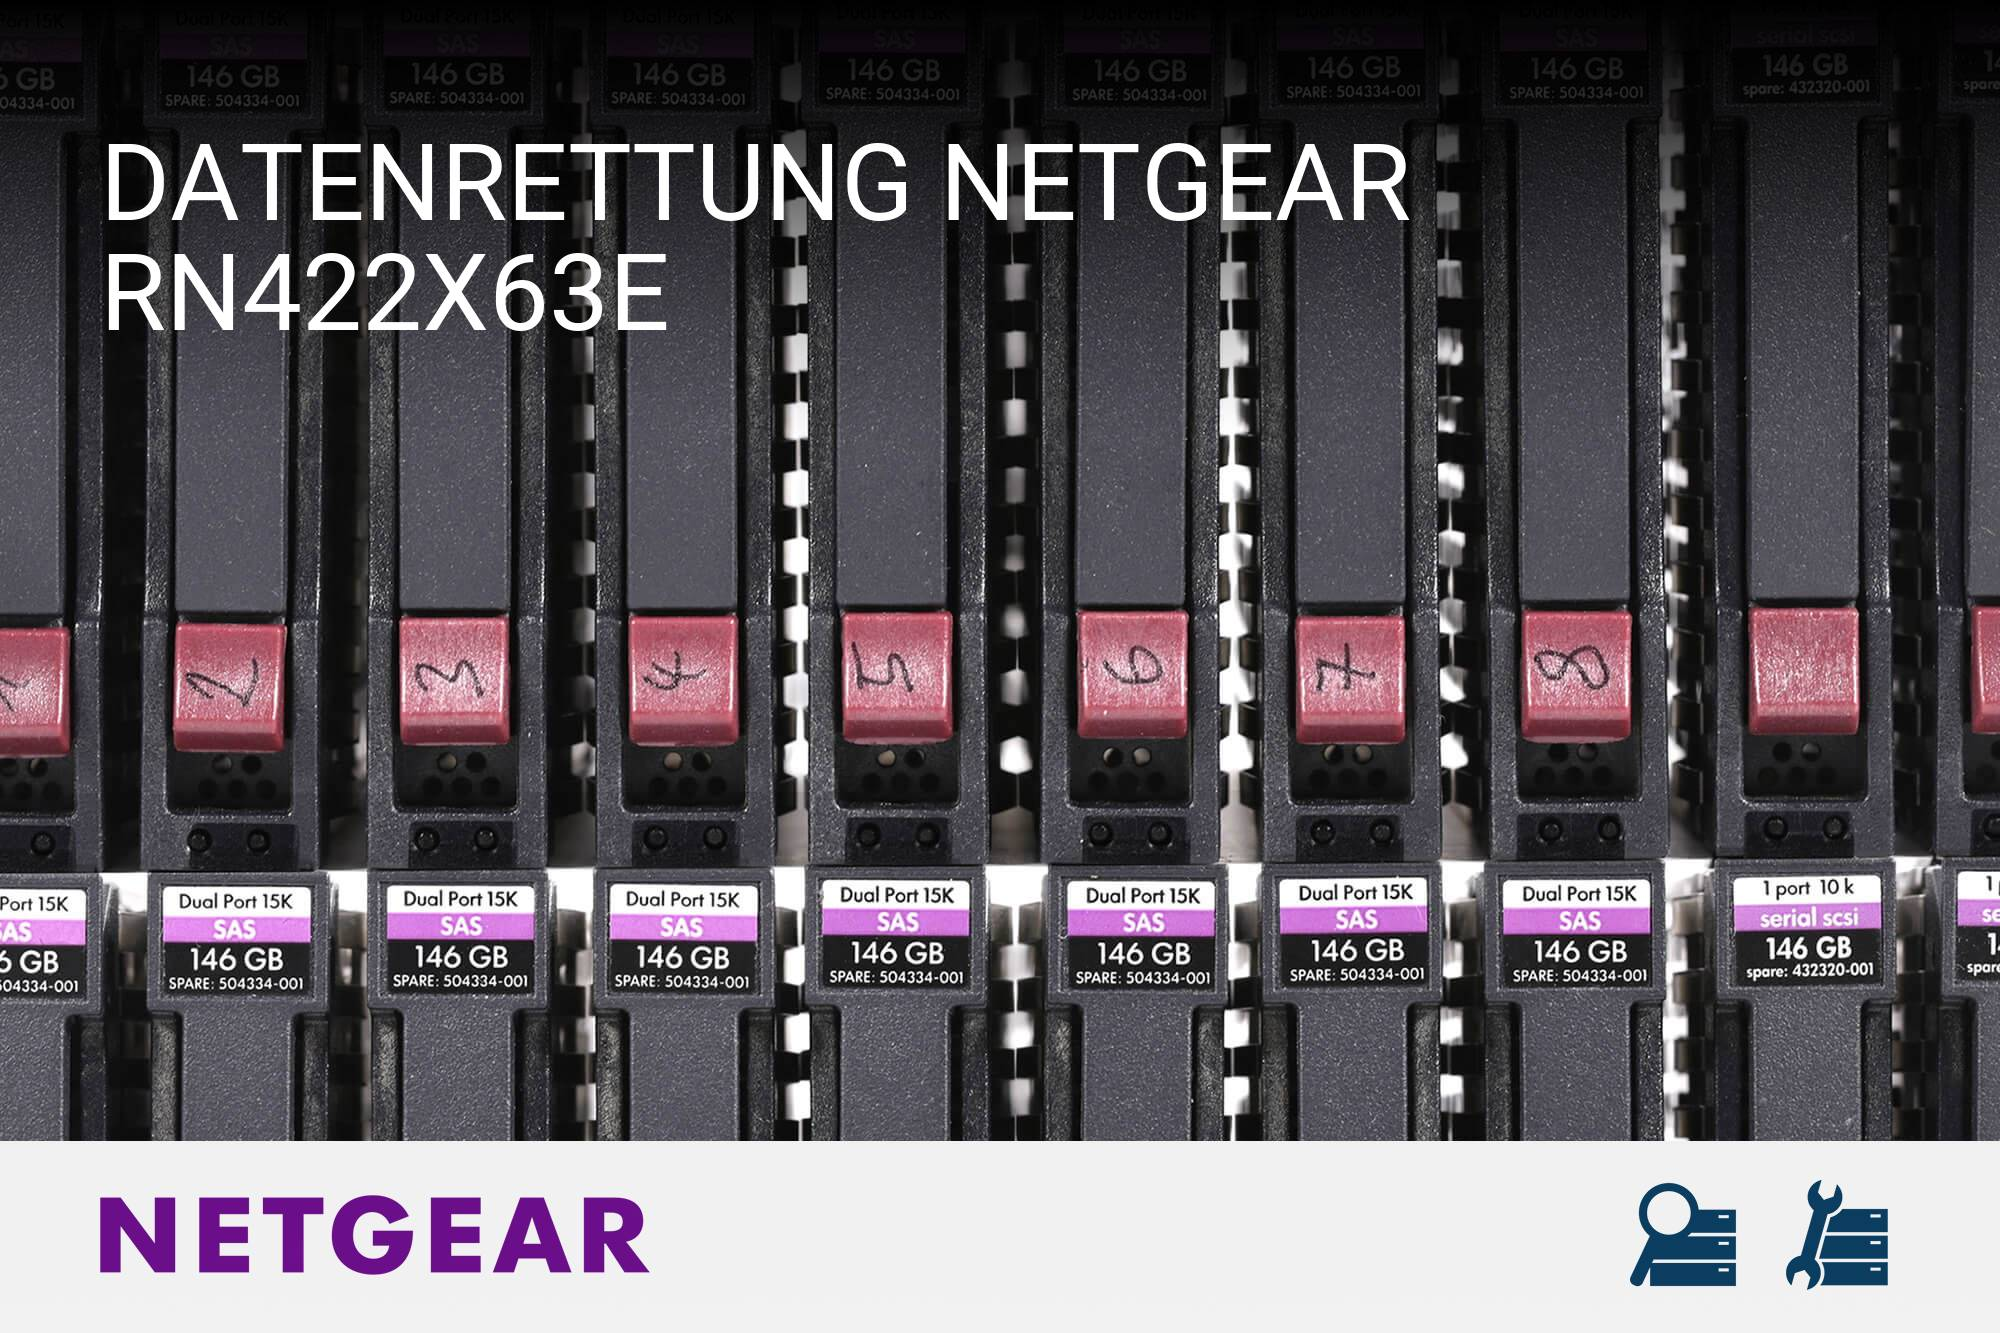 Netgear RN422X63E